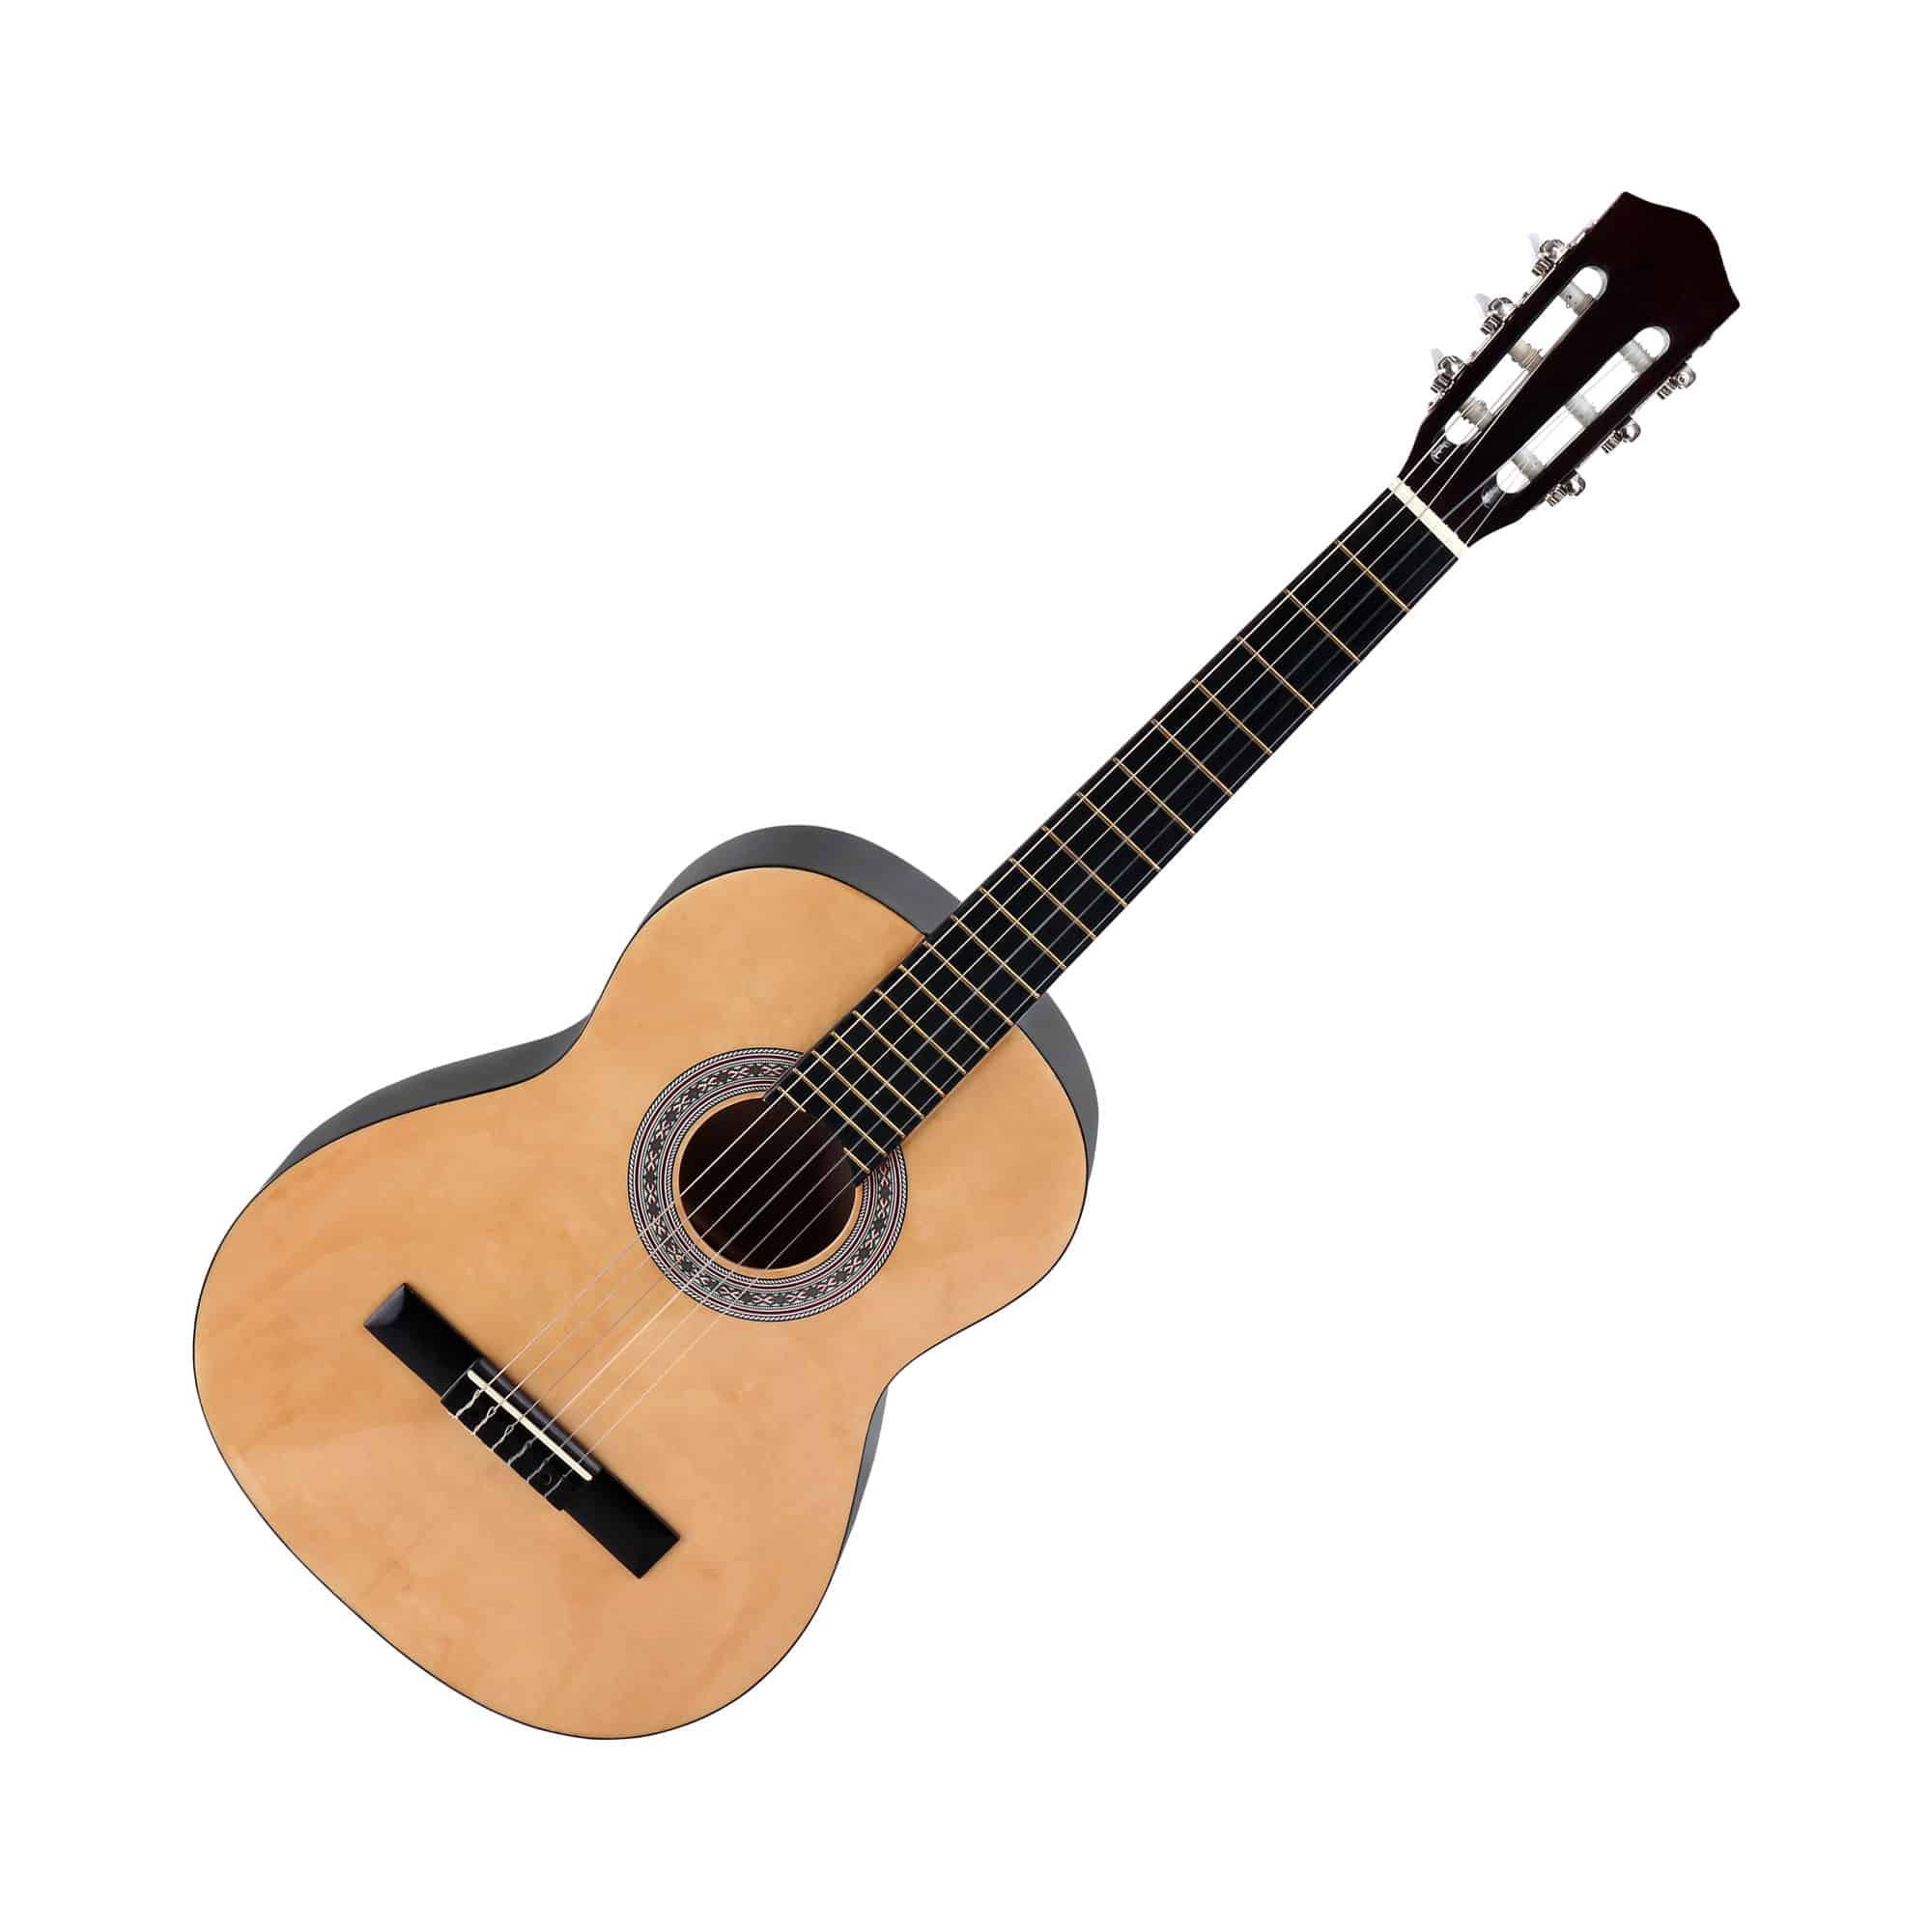 Calida Benita Konzertgitarre 1|2 Natur